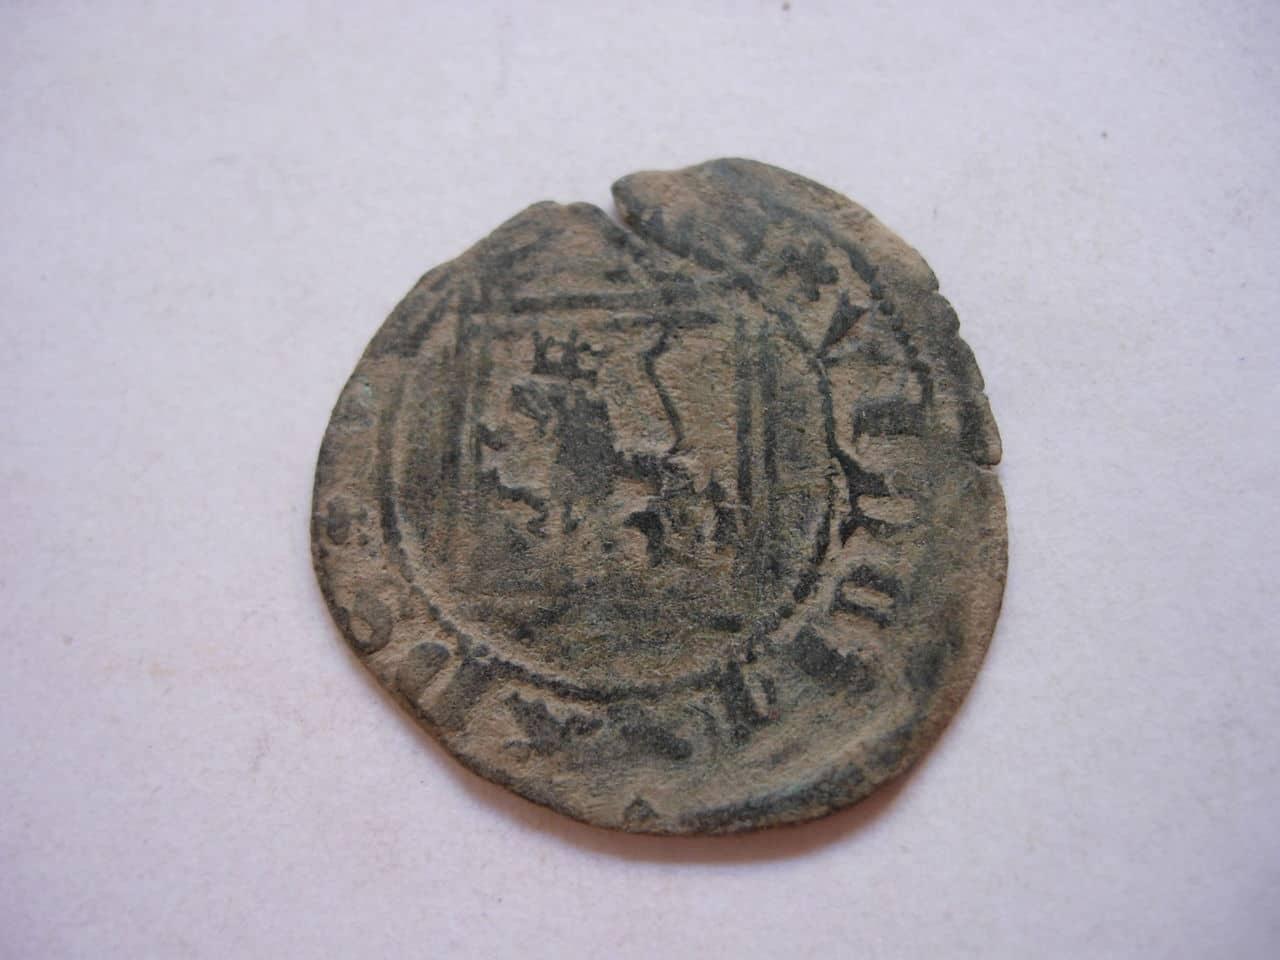 Blanca del ordenamiento de Segovia de 1471. Enrique IV. Segovia. Baj_138